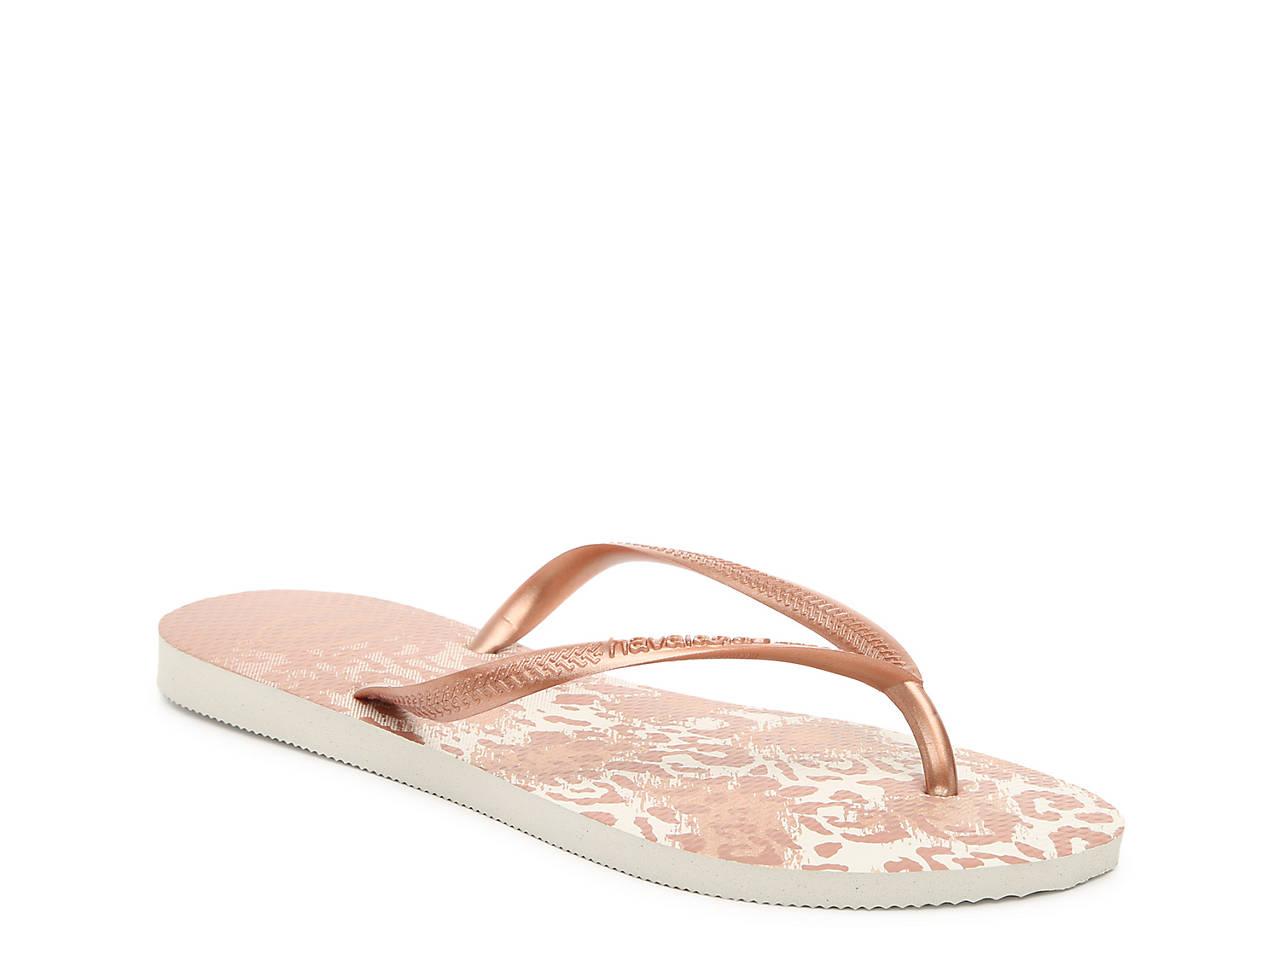 9f23034ca Havaianas Slim Animals Flip Flop Women s Shoes